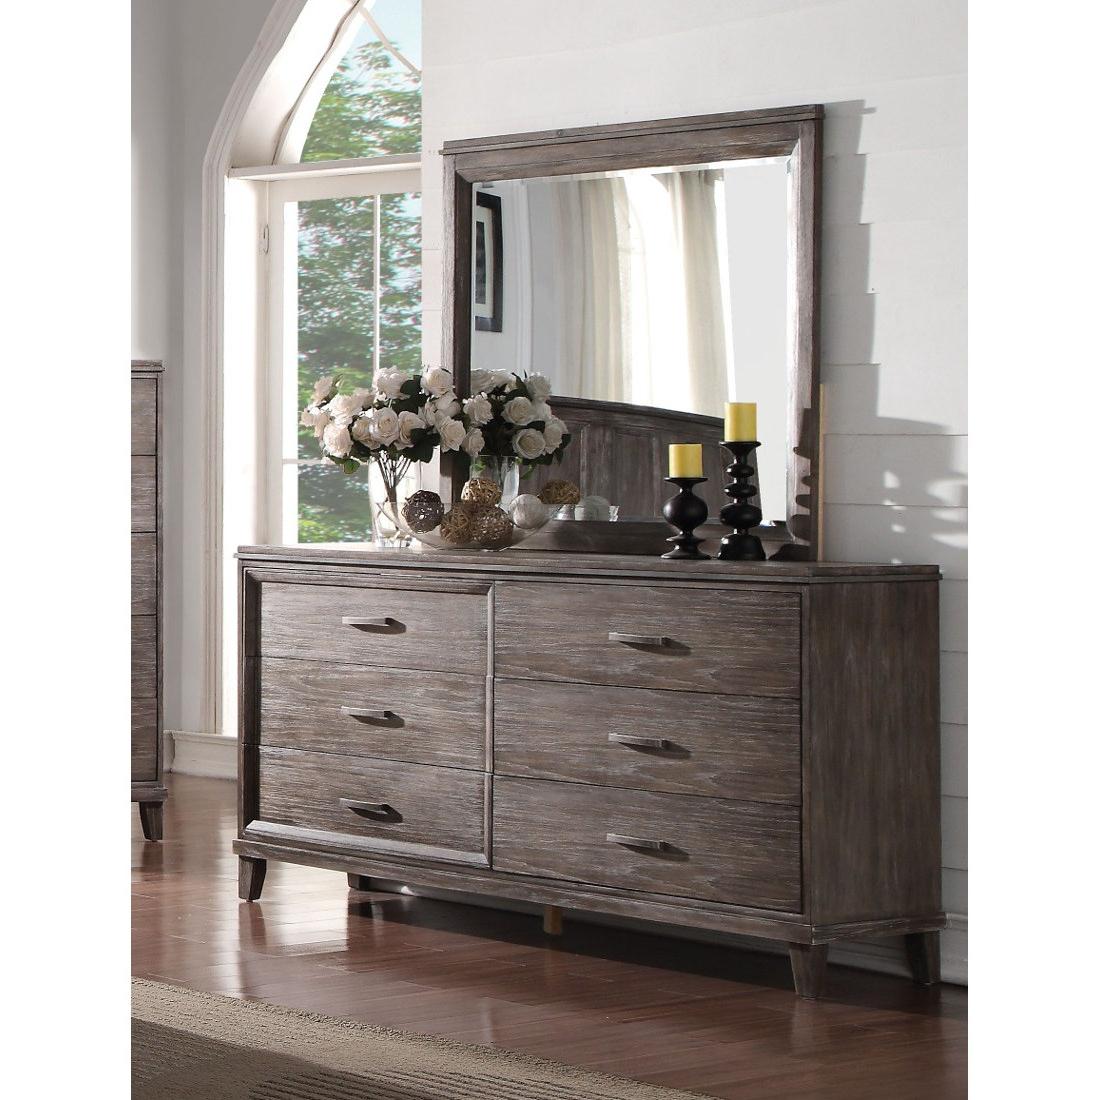 Acme Bayonne Dresser With Mirror In Burnt Oak In Burnt Oak Metal Sideboards (View 2 of 20)